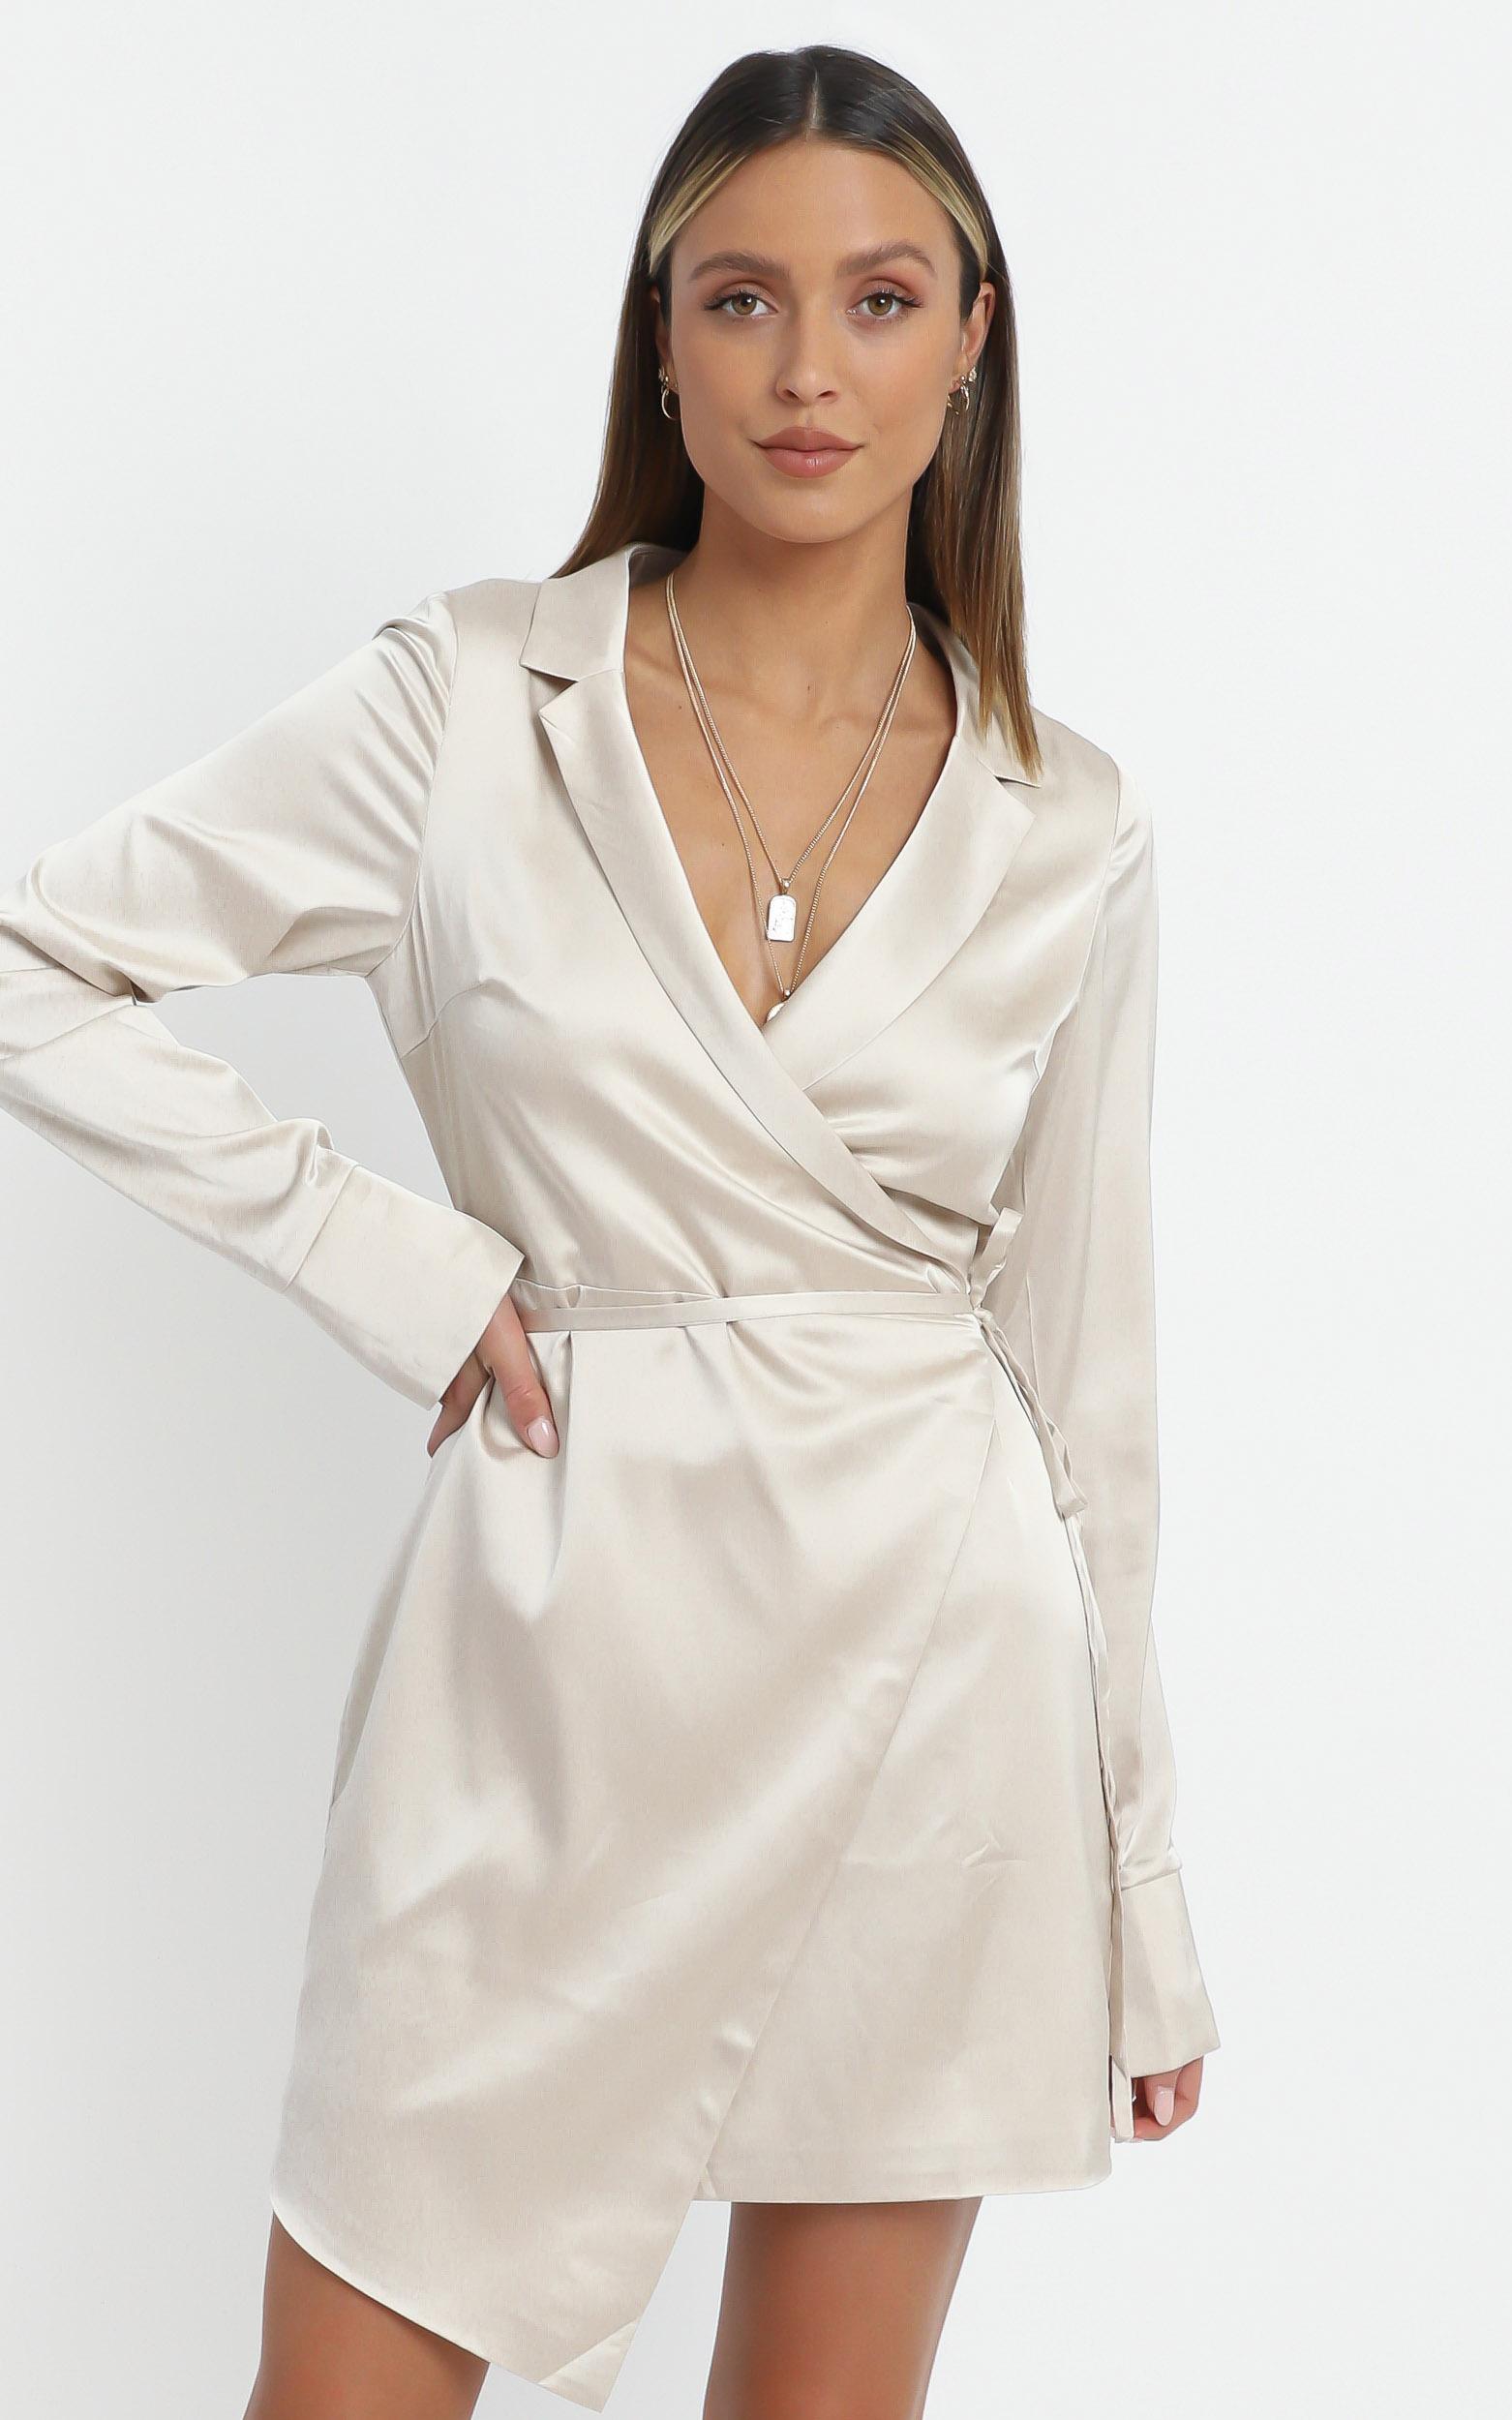 Loren Dress in Champagne - 14 (XL), Beige, hi-res image number null